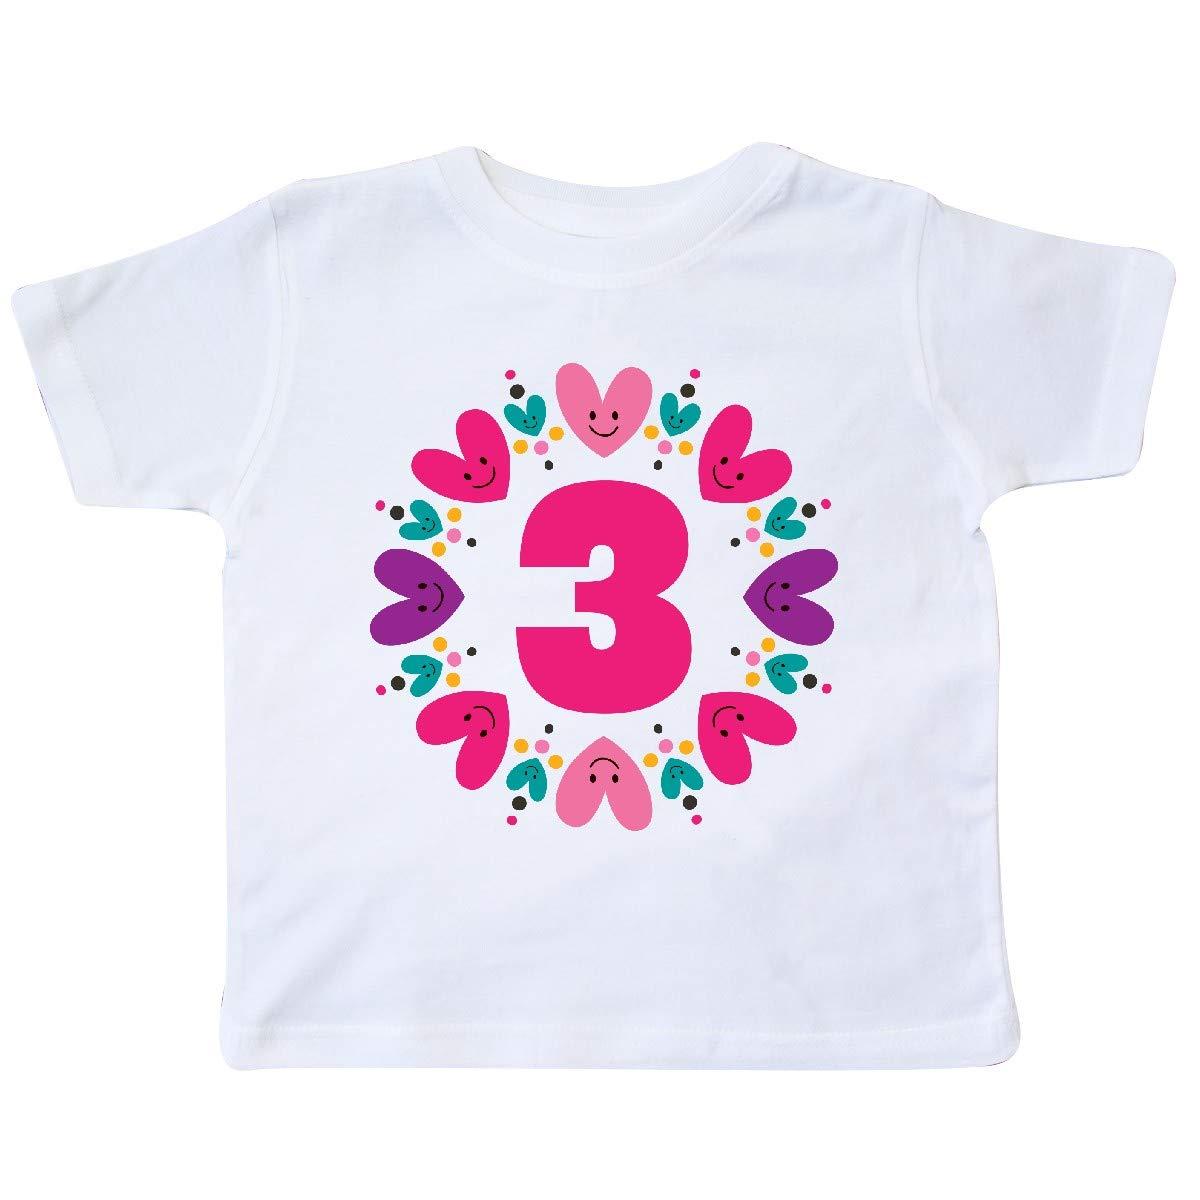 inktastic 3rd Birthday Heart Wreath Girls Toddler T-Shirt